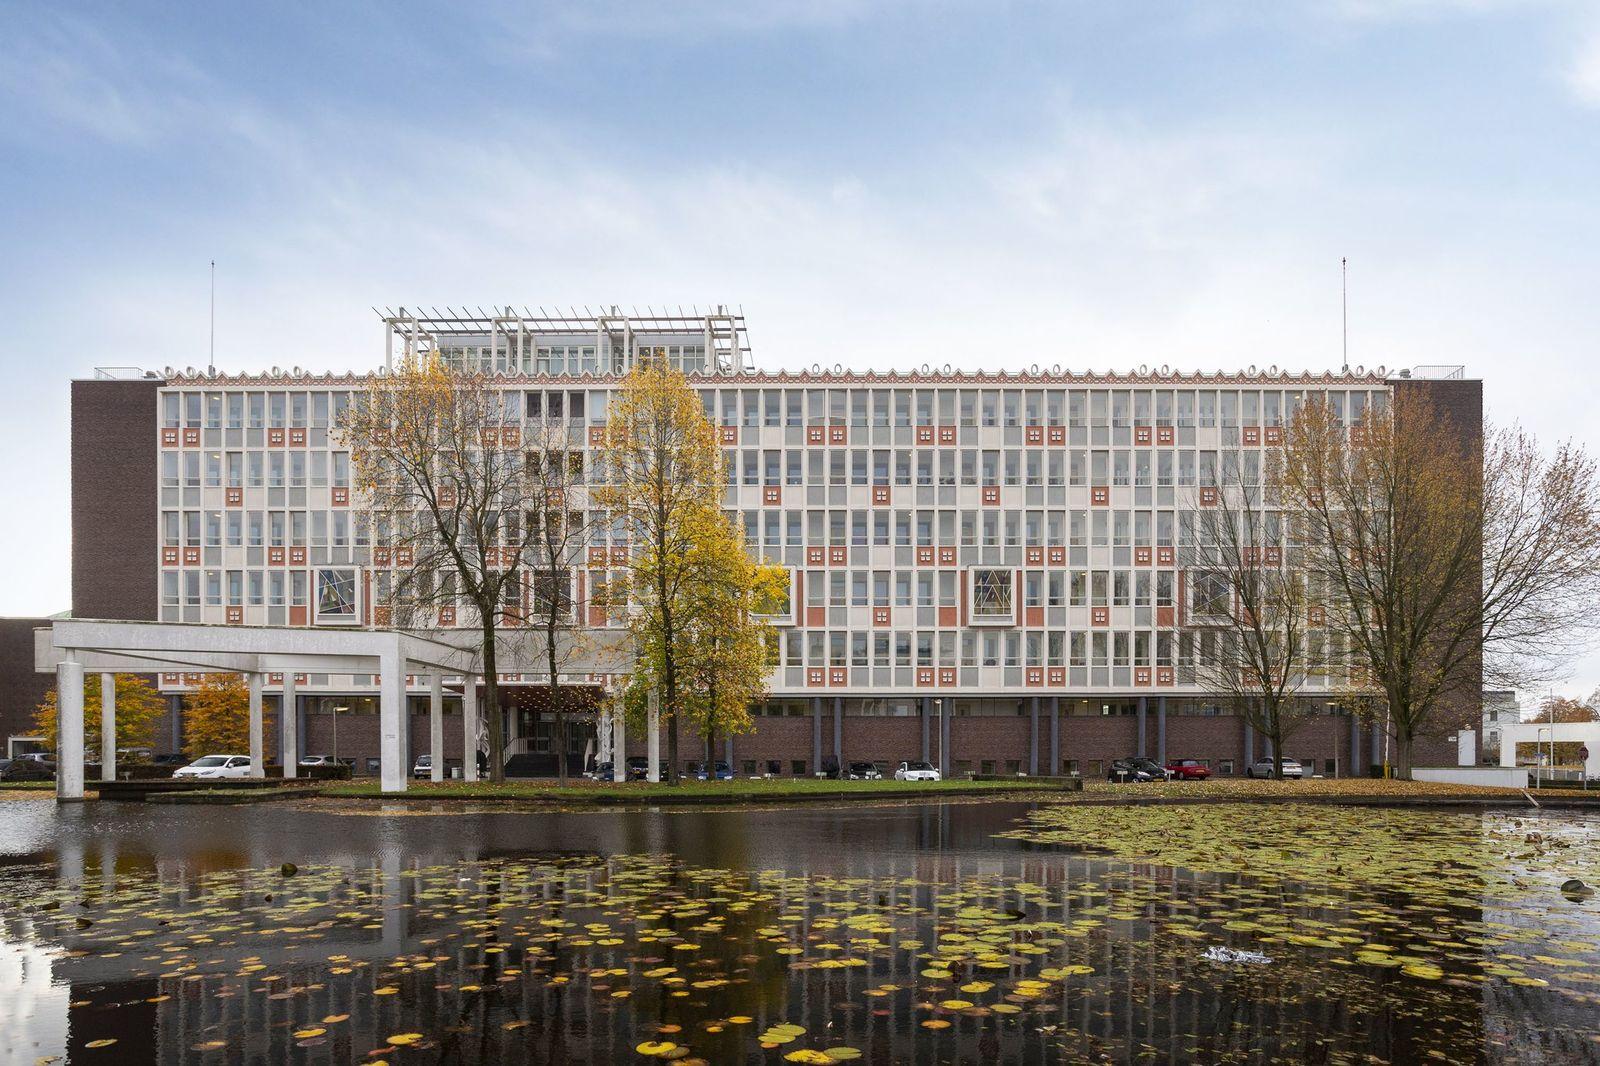 Tivolilaan 179, Arnhem